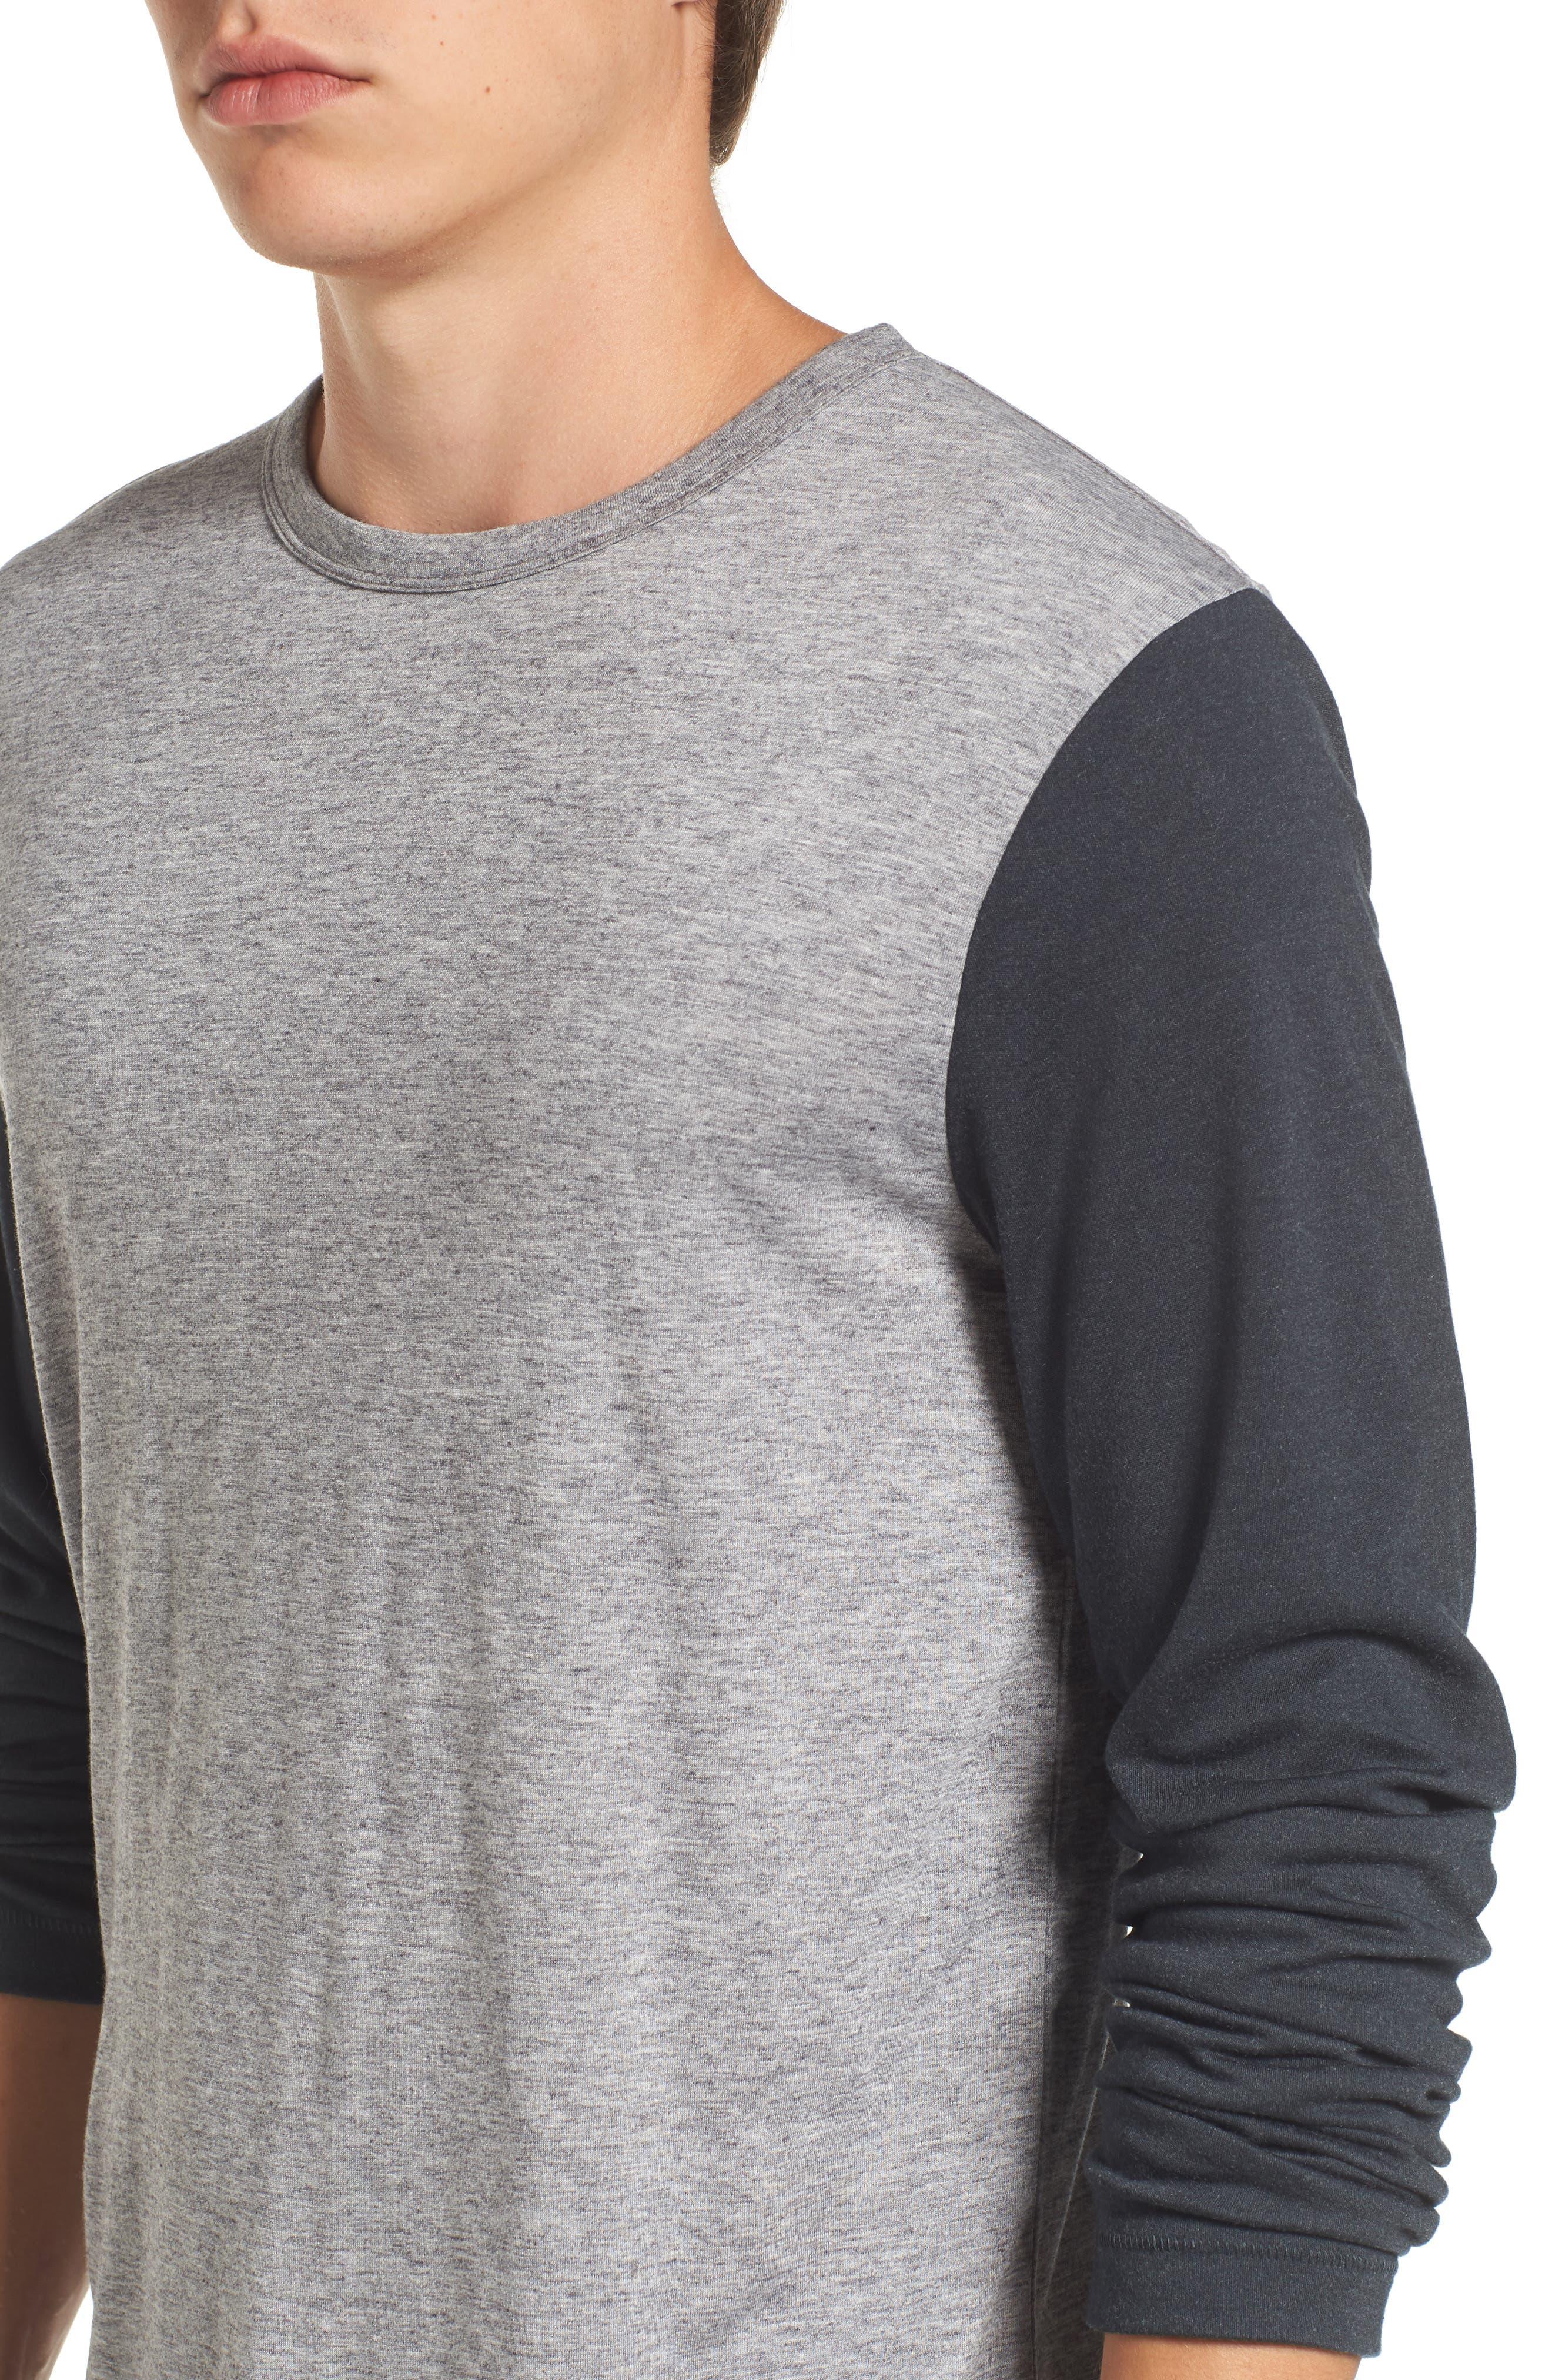 Contrast Long Sleeve T-Shirt,                             Alternate thumbnail 4, color,                             Grey Melange/ Ebony